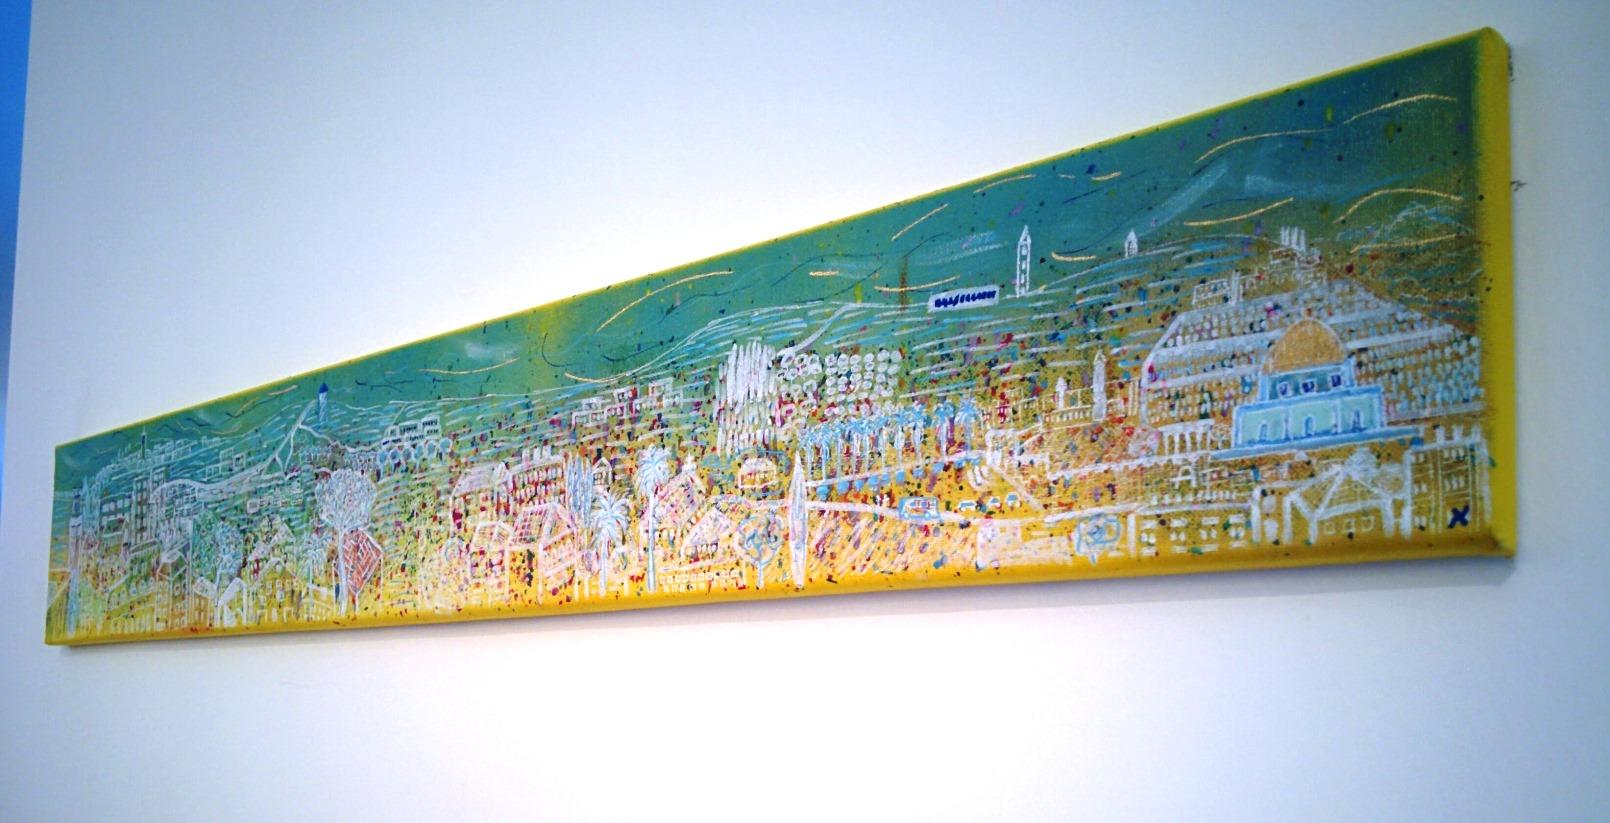 Ari Marache's interpretation of the view. Photo by Abigail Klein Leichman